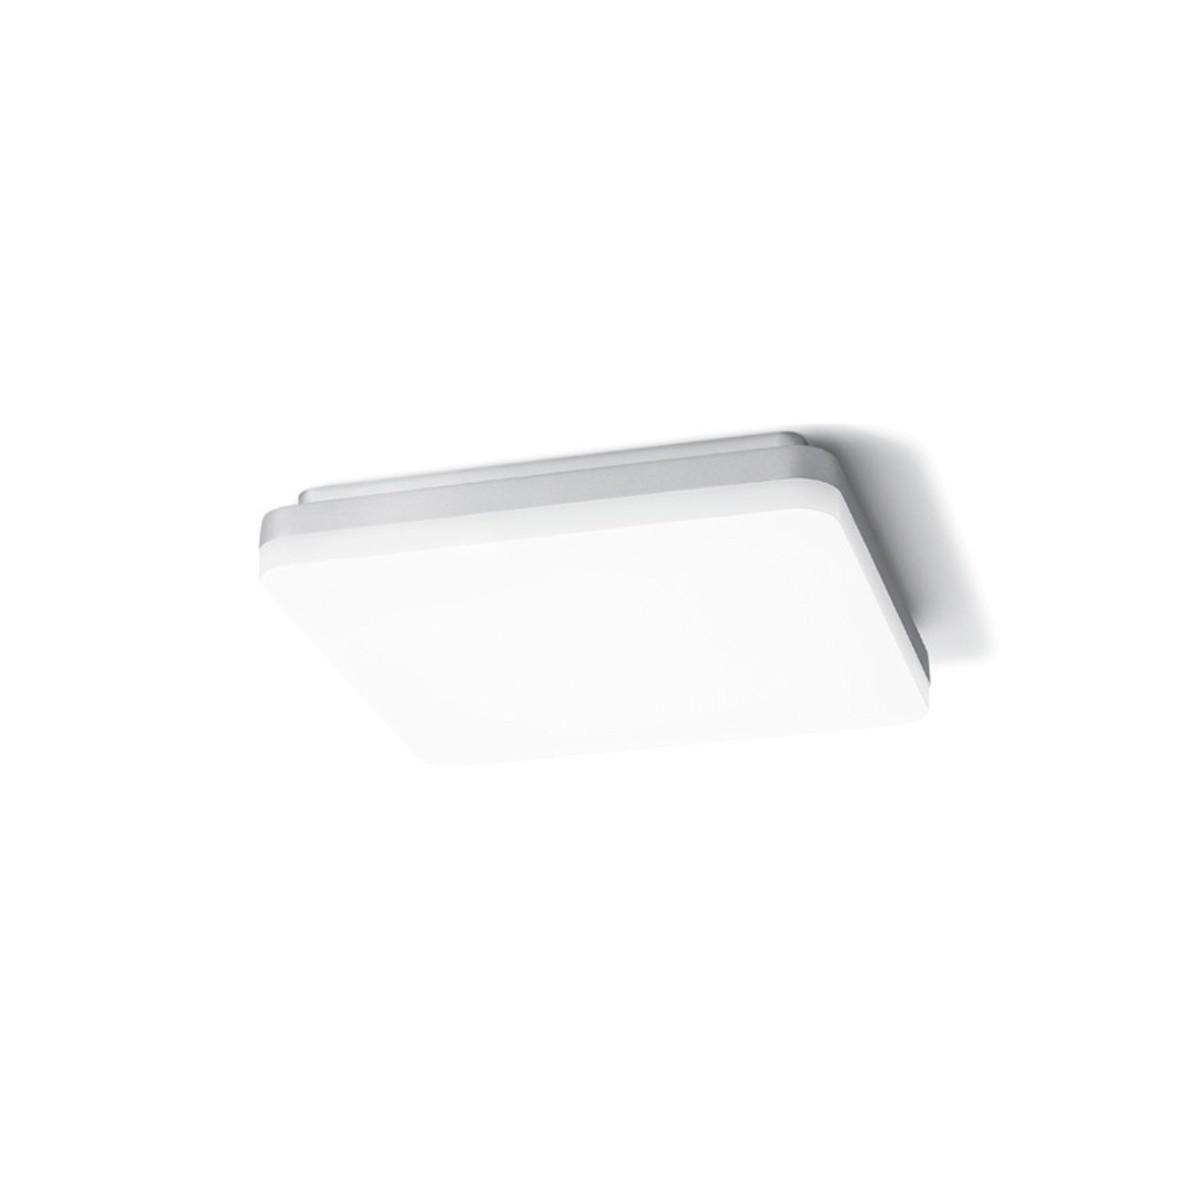 Sigor Square LED Deckenleuchte IP44, 4000 K, Silber